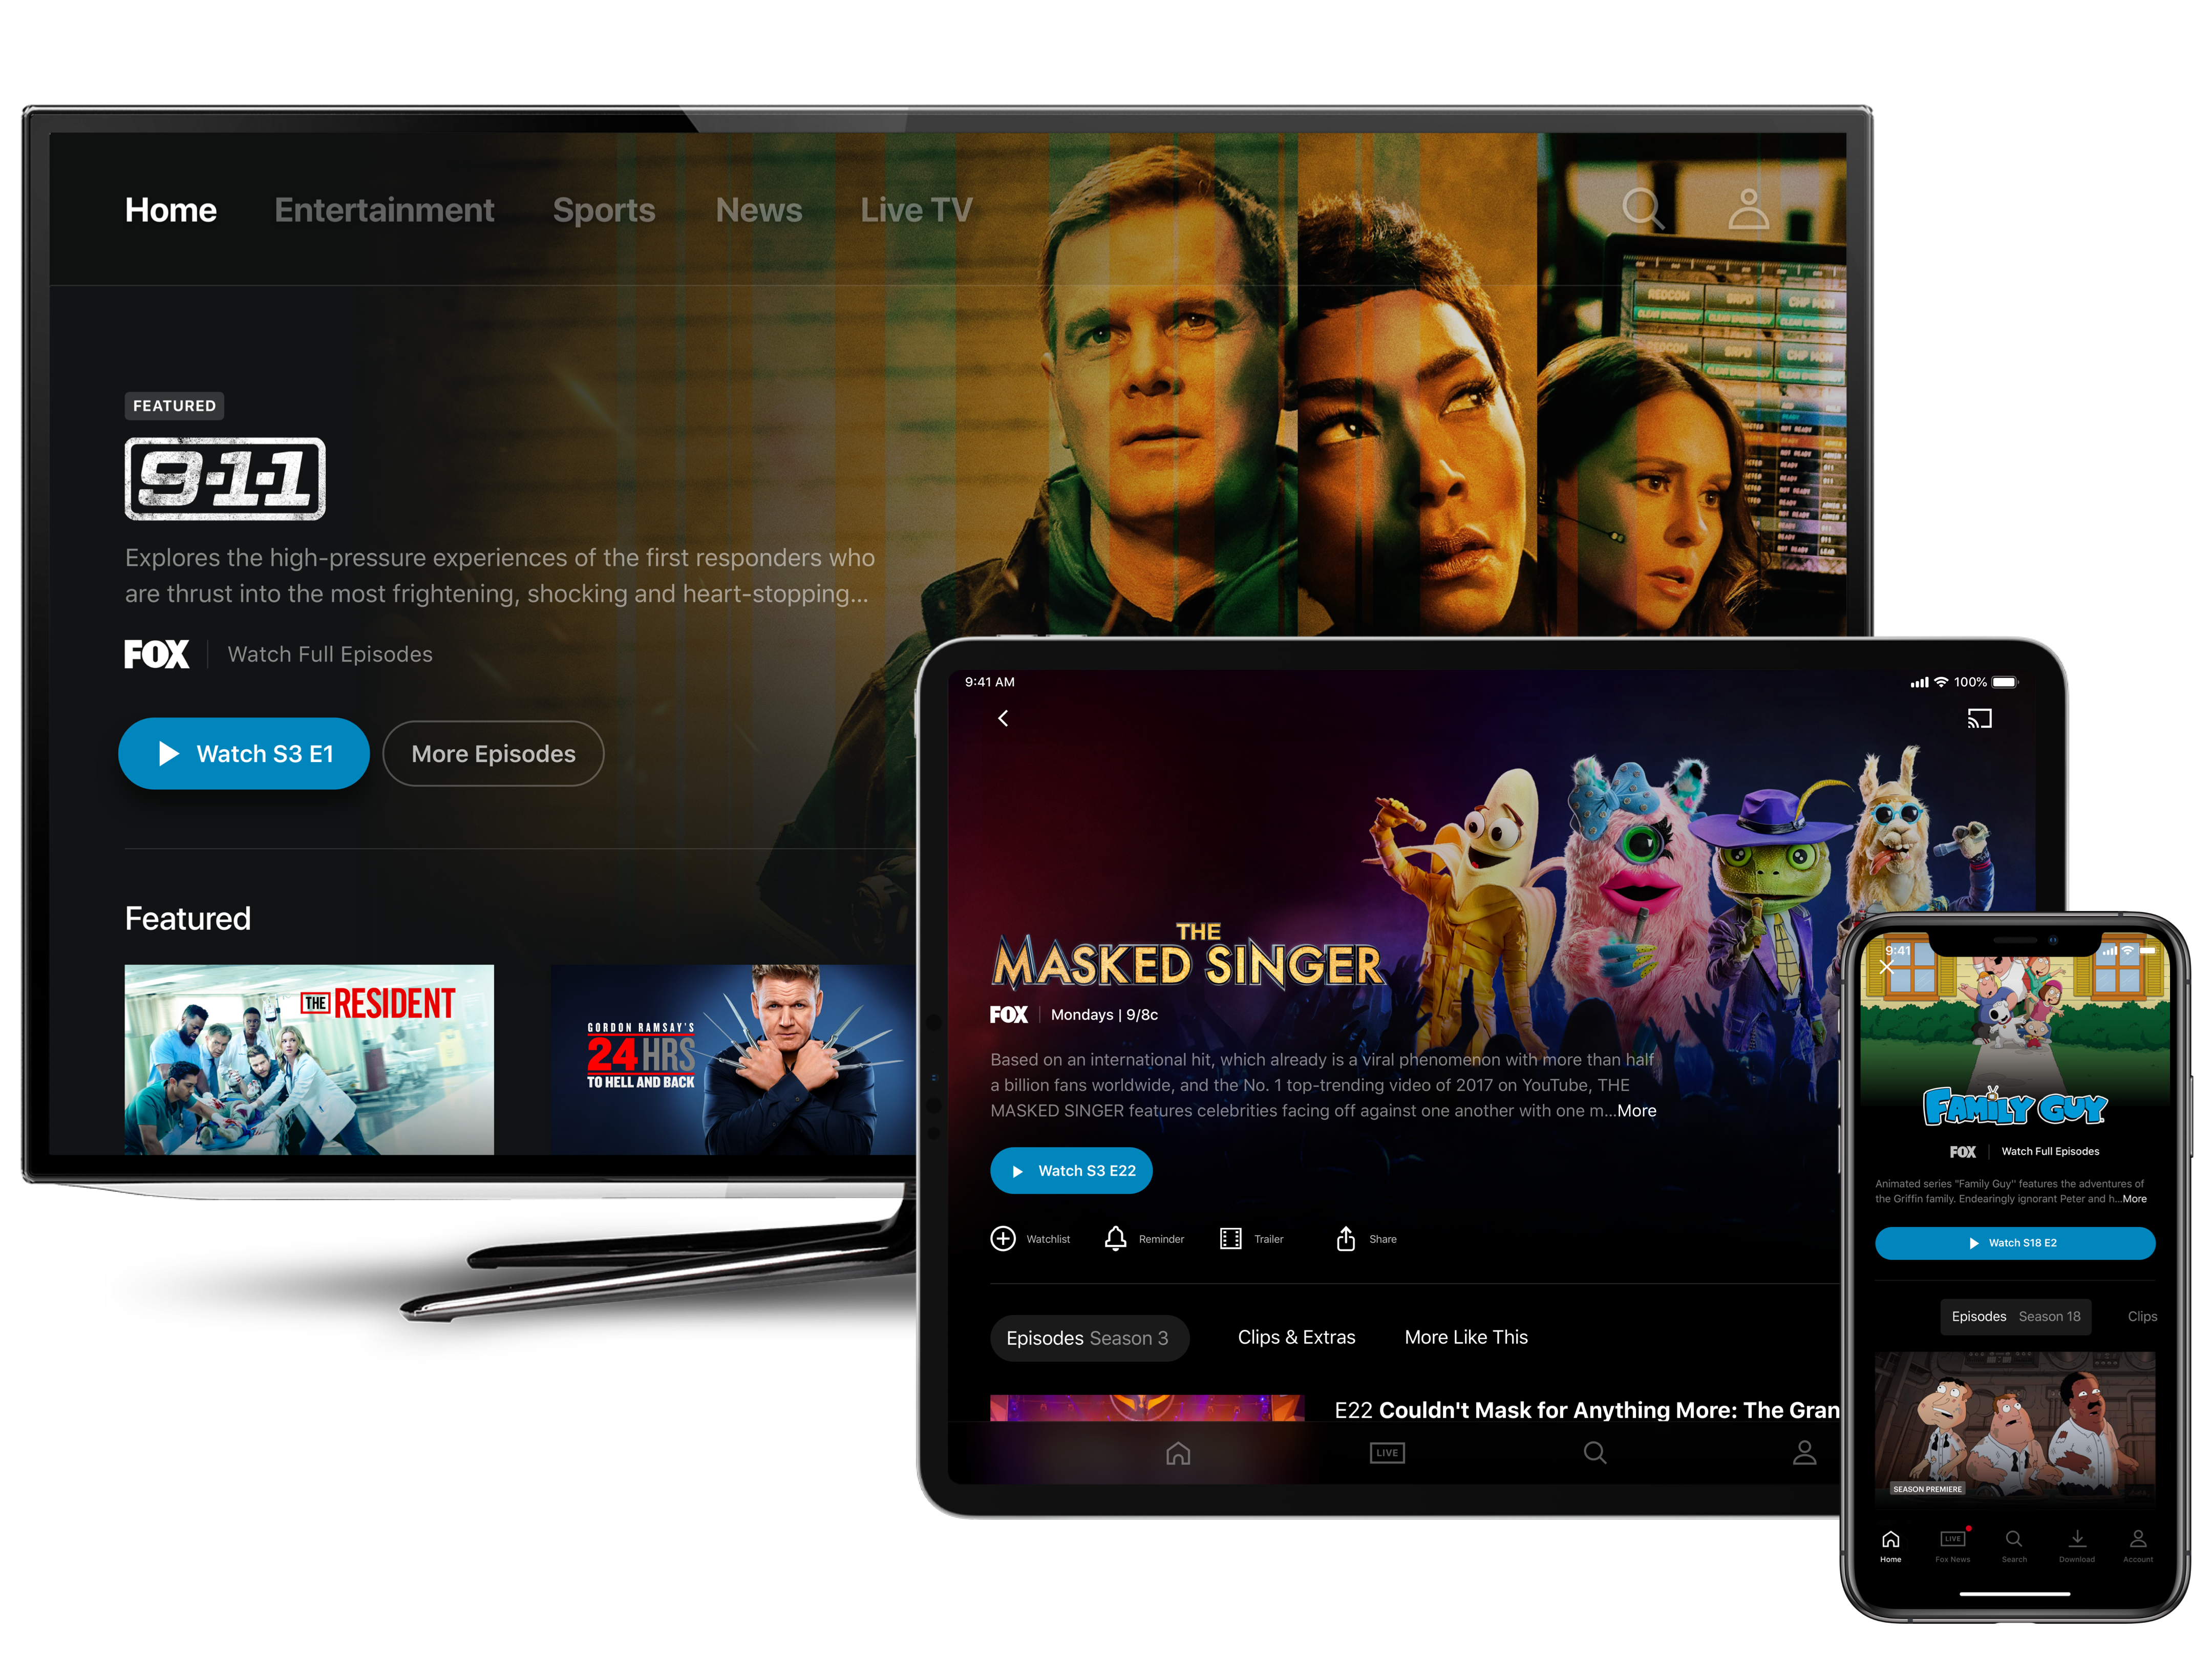 Fox Now App Stream Full Episodes With Fox Now